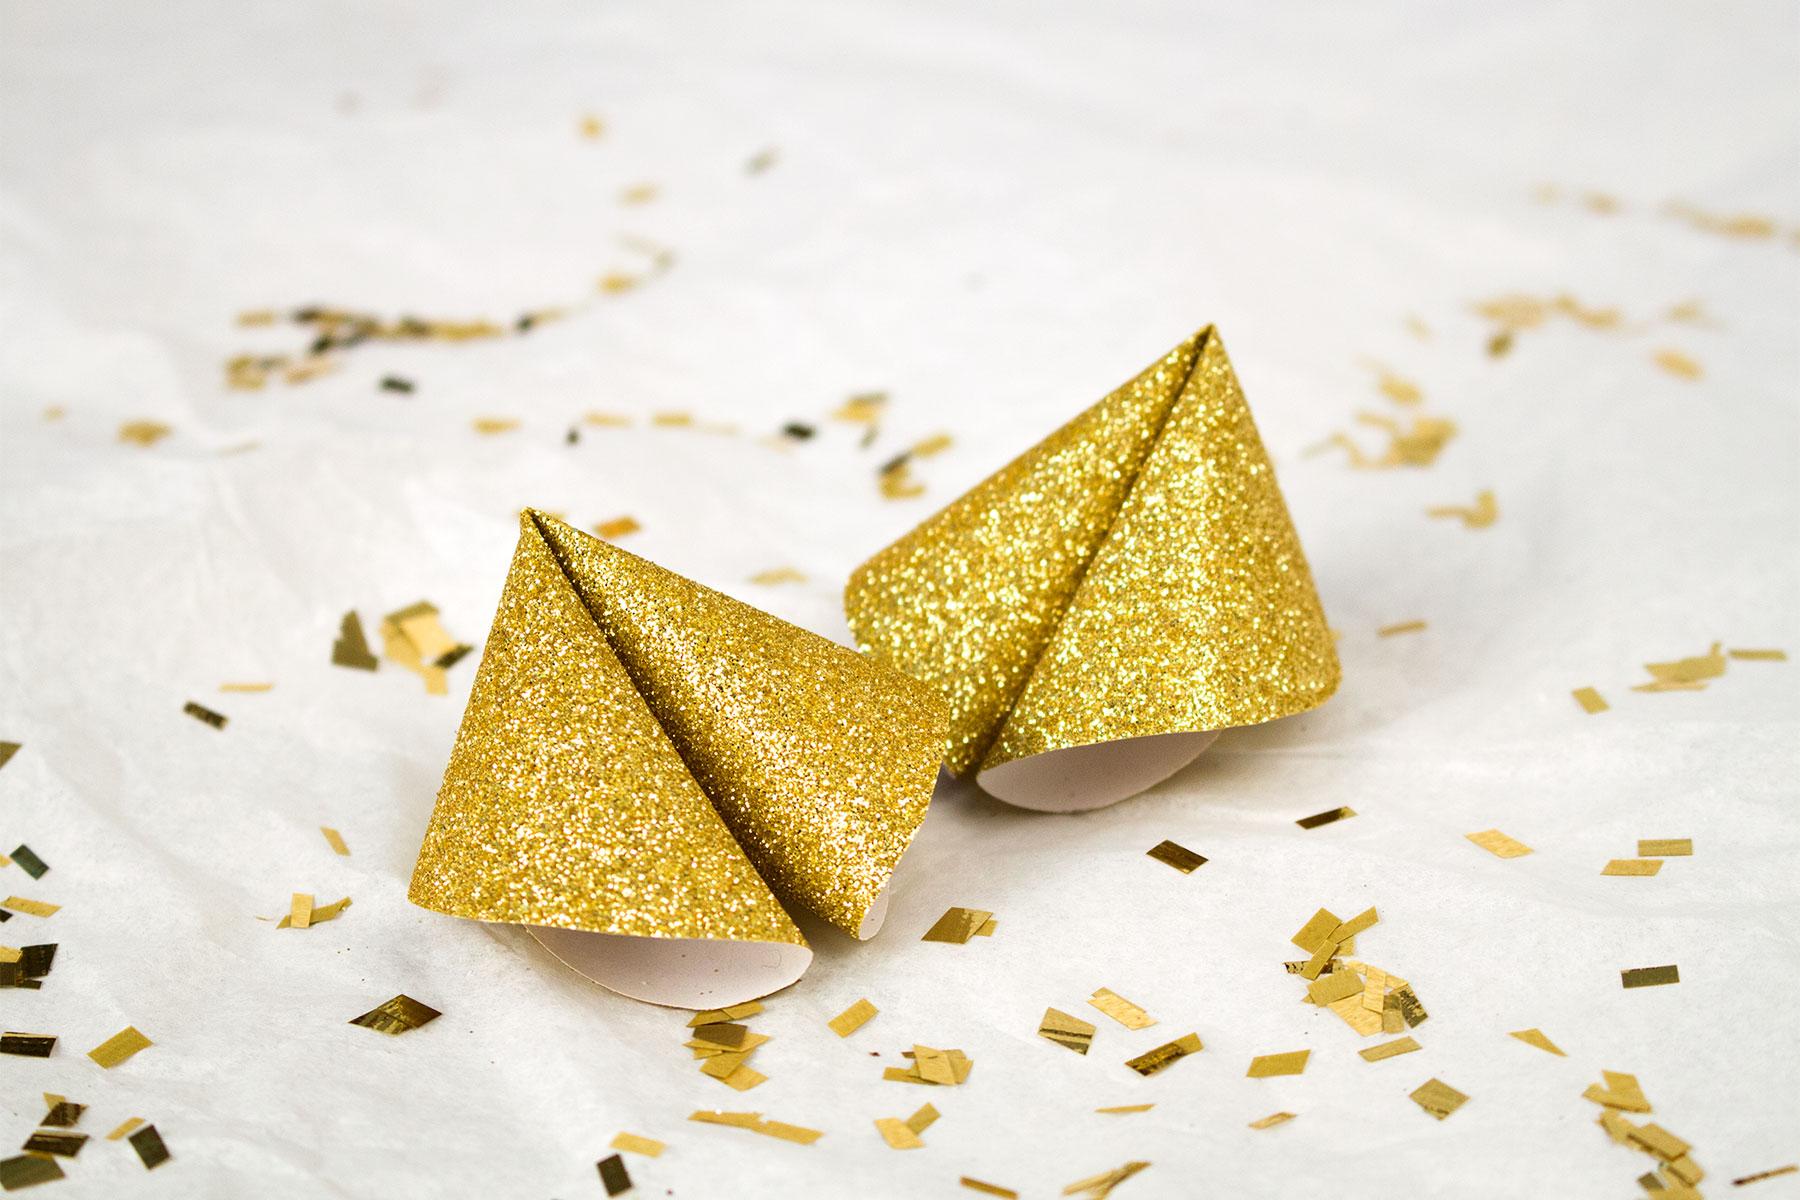 Glückskekse Zum Basteln Glückskekse Sprüche Für Silvester